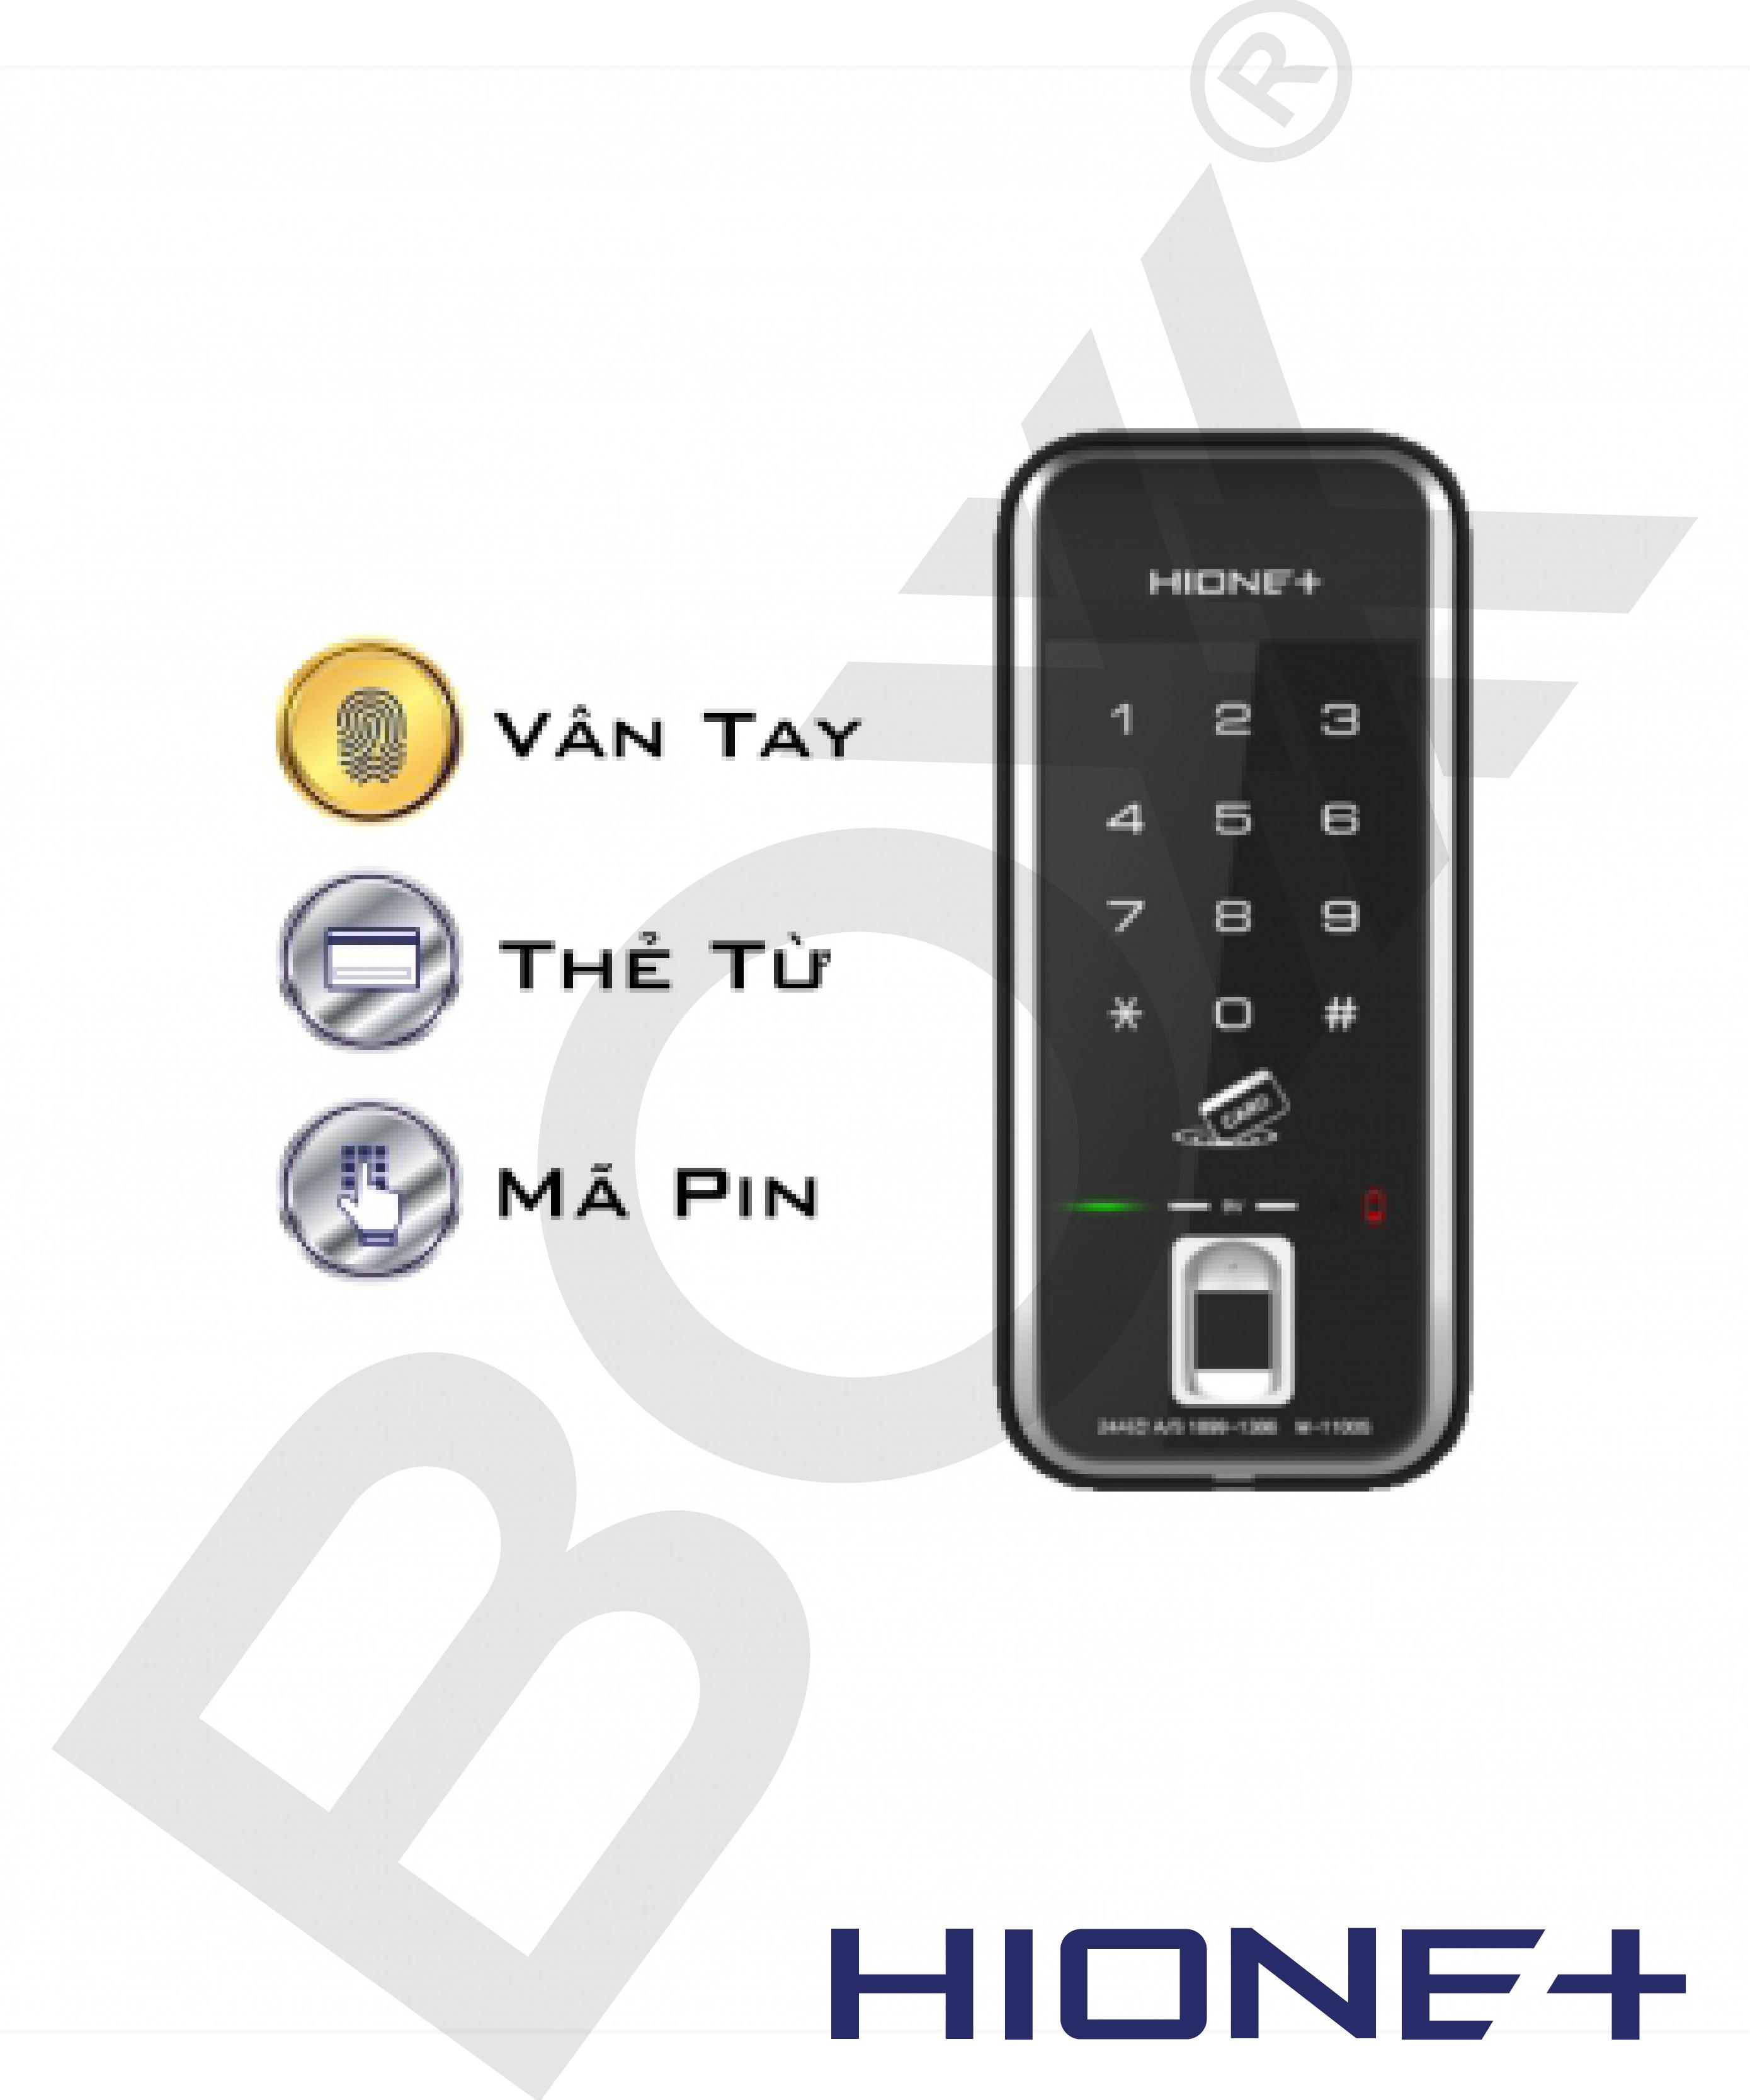 Khóa mini vân tay/ thẻ từ/ mật khẩu M1190